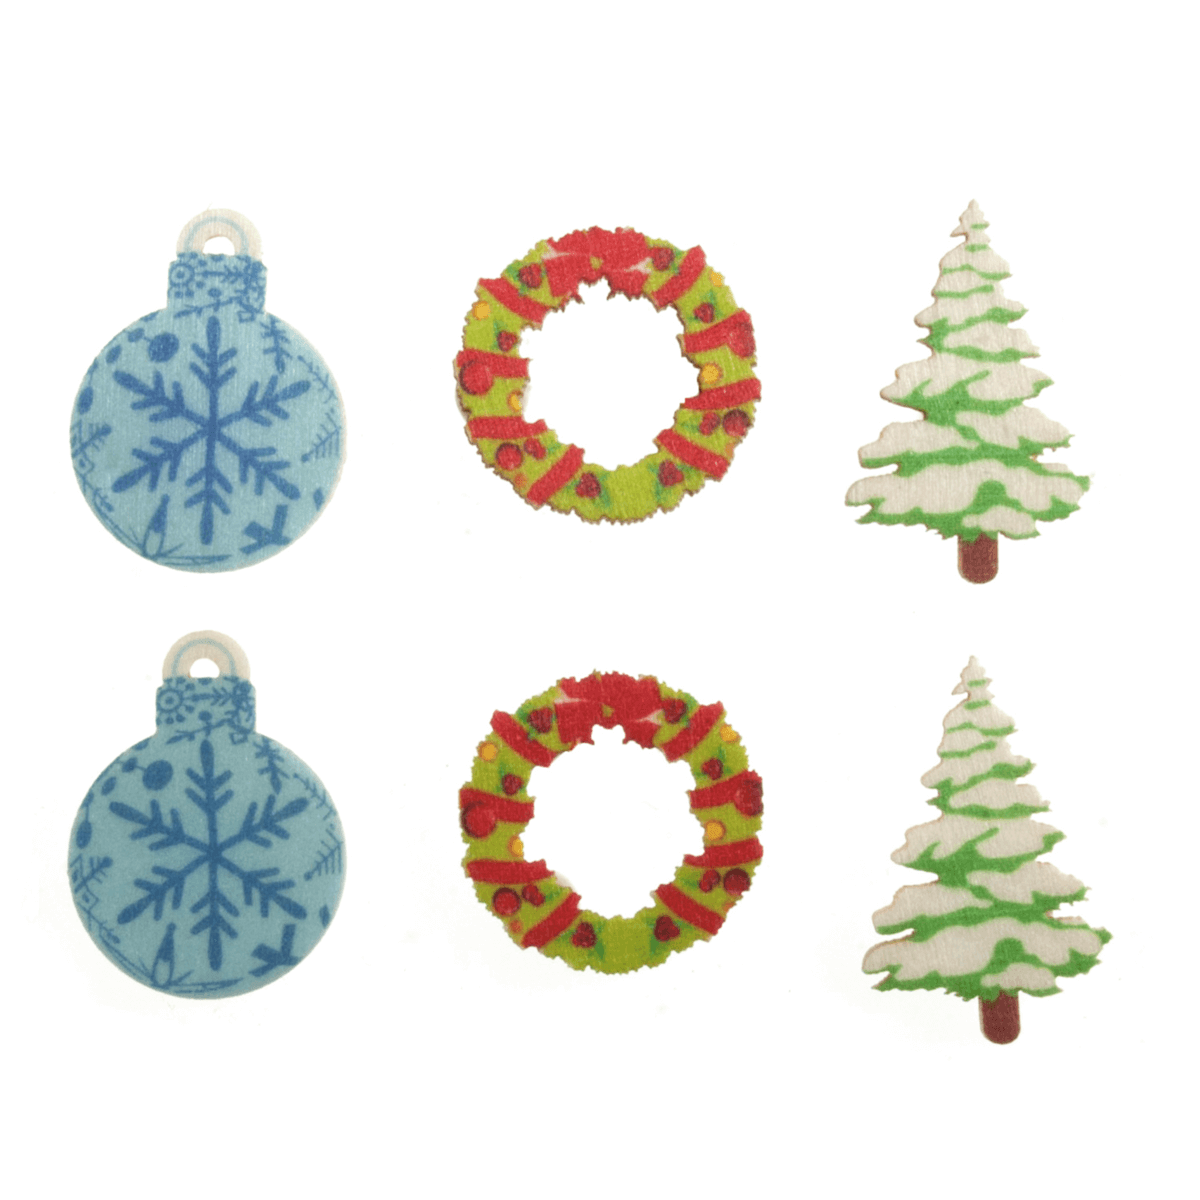 10 x Christmas Wooden Assortment  Embellishments Scrap booking